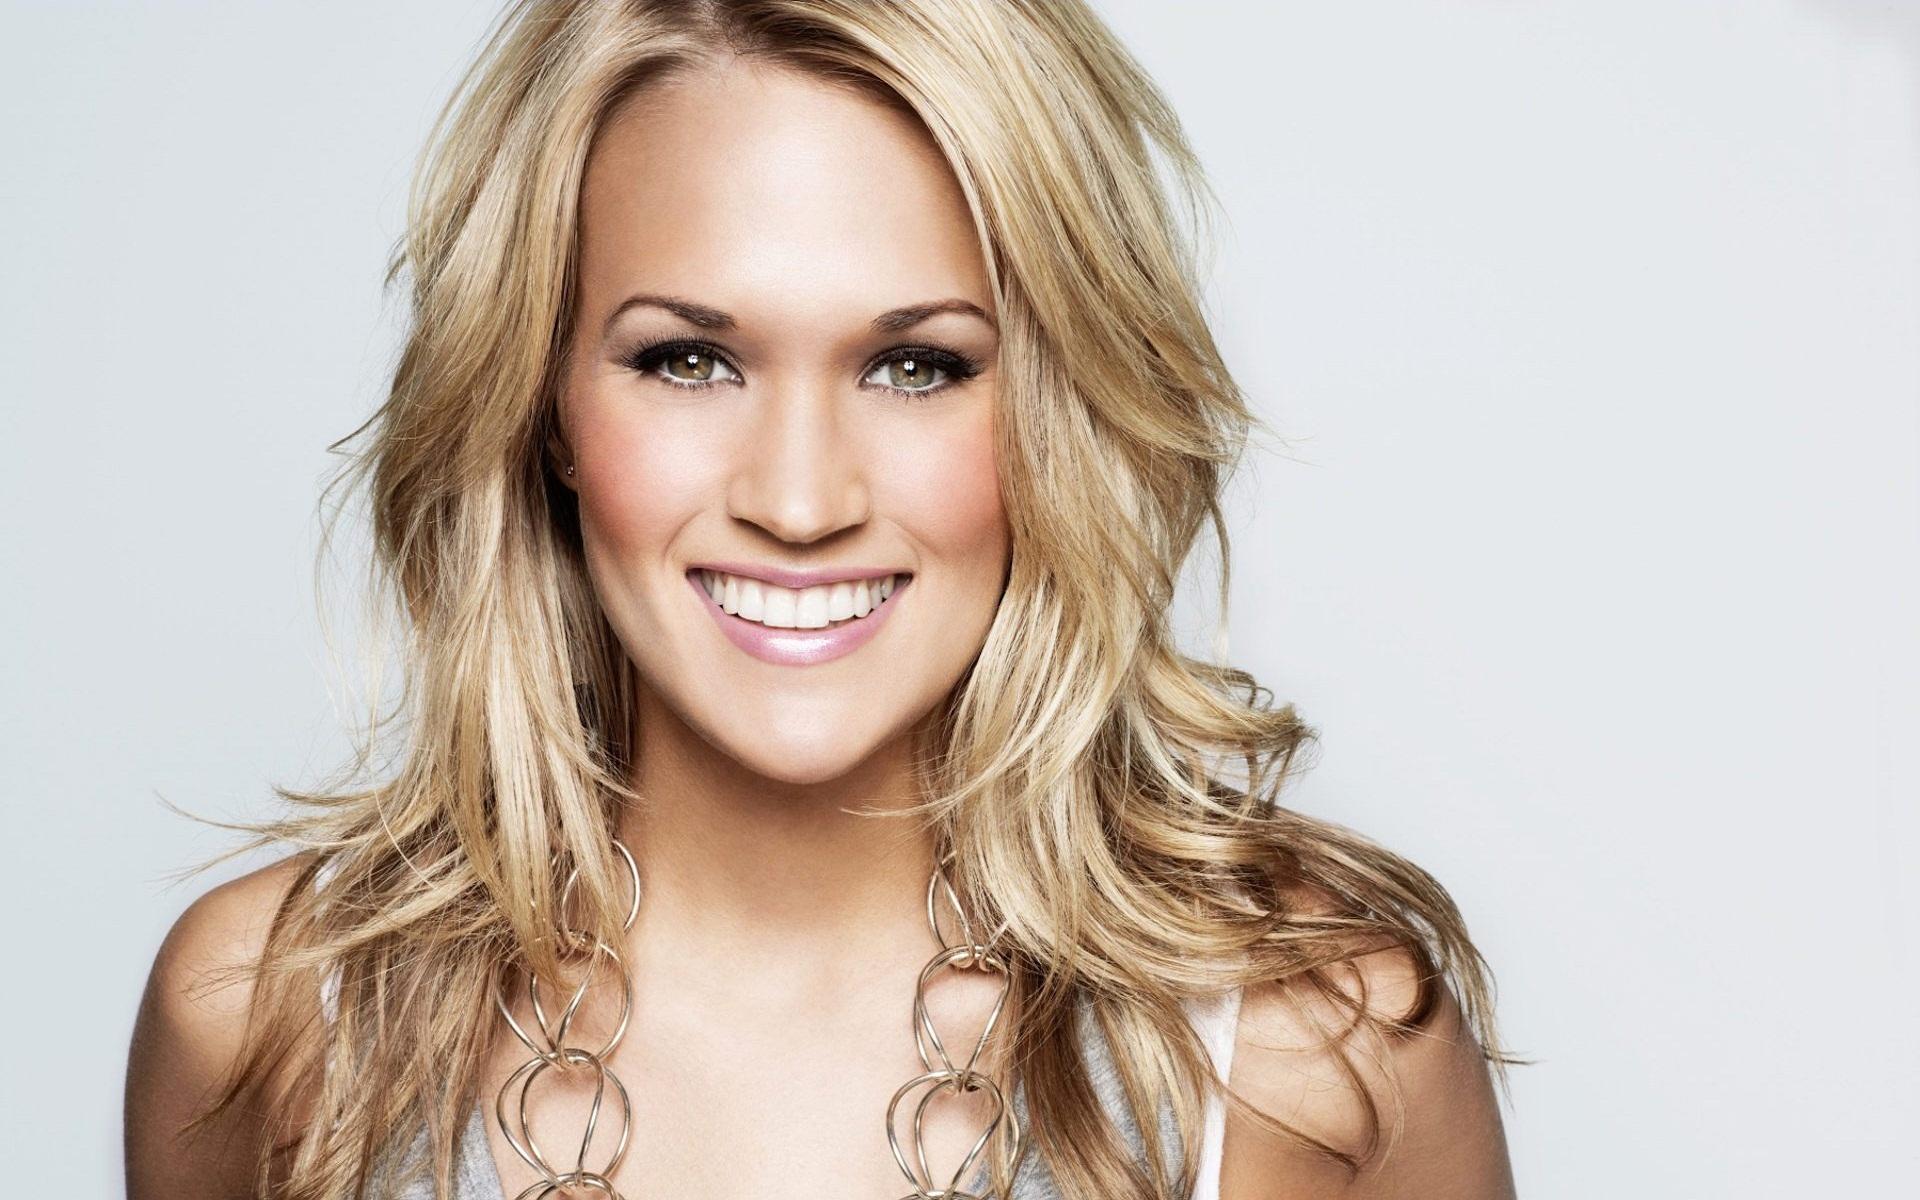 Carrie Underwood Nose Job